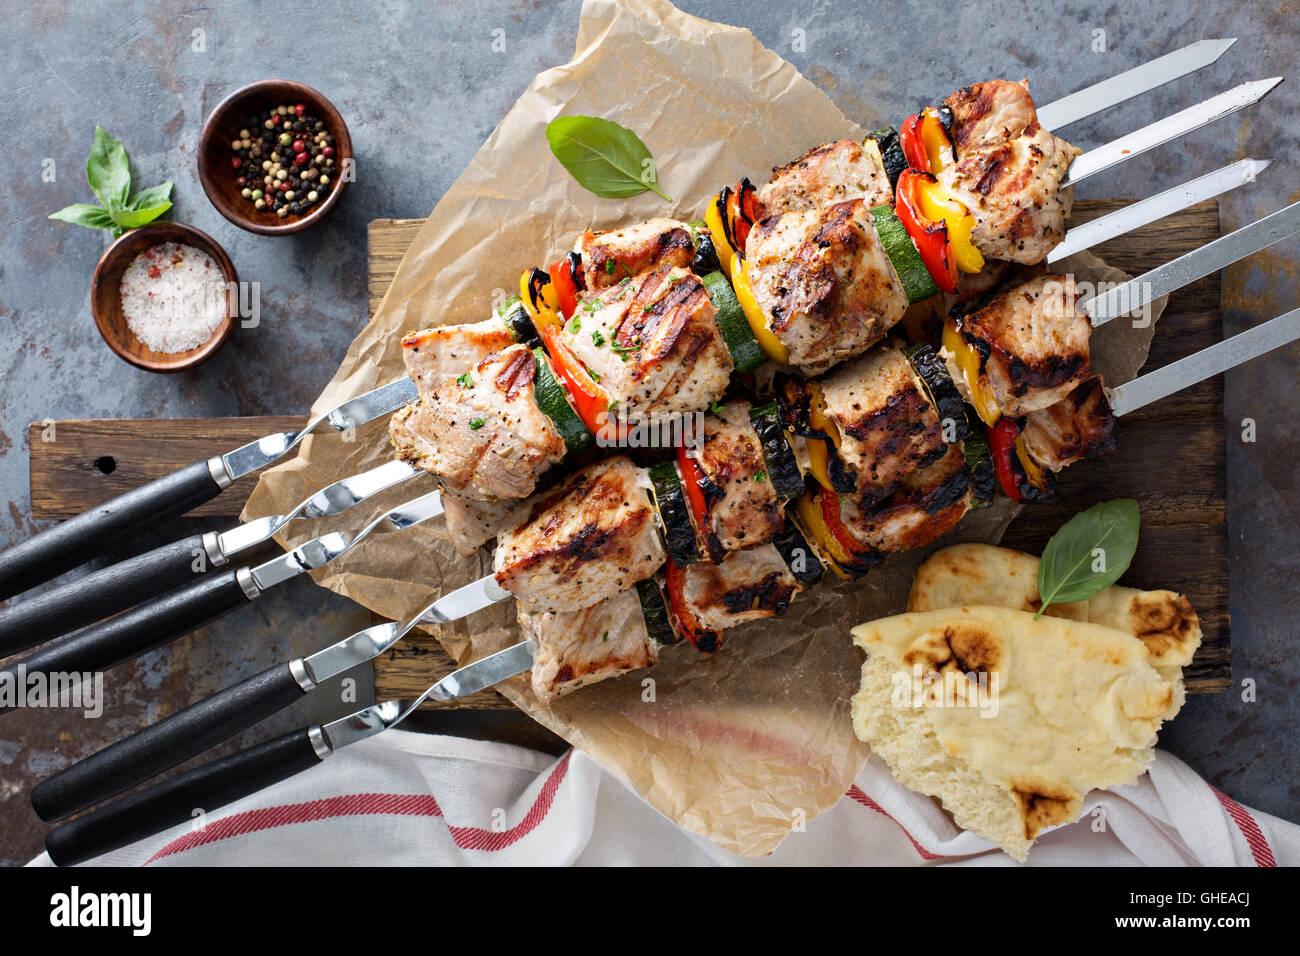 Pork and vegetable kebabs - Stock Image